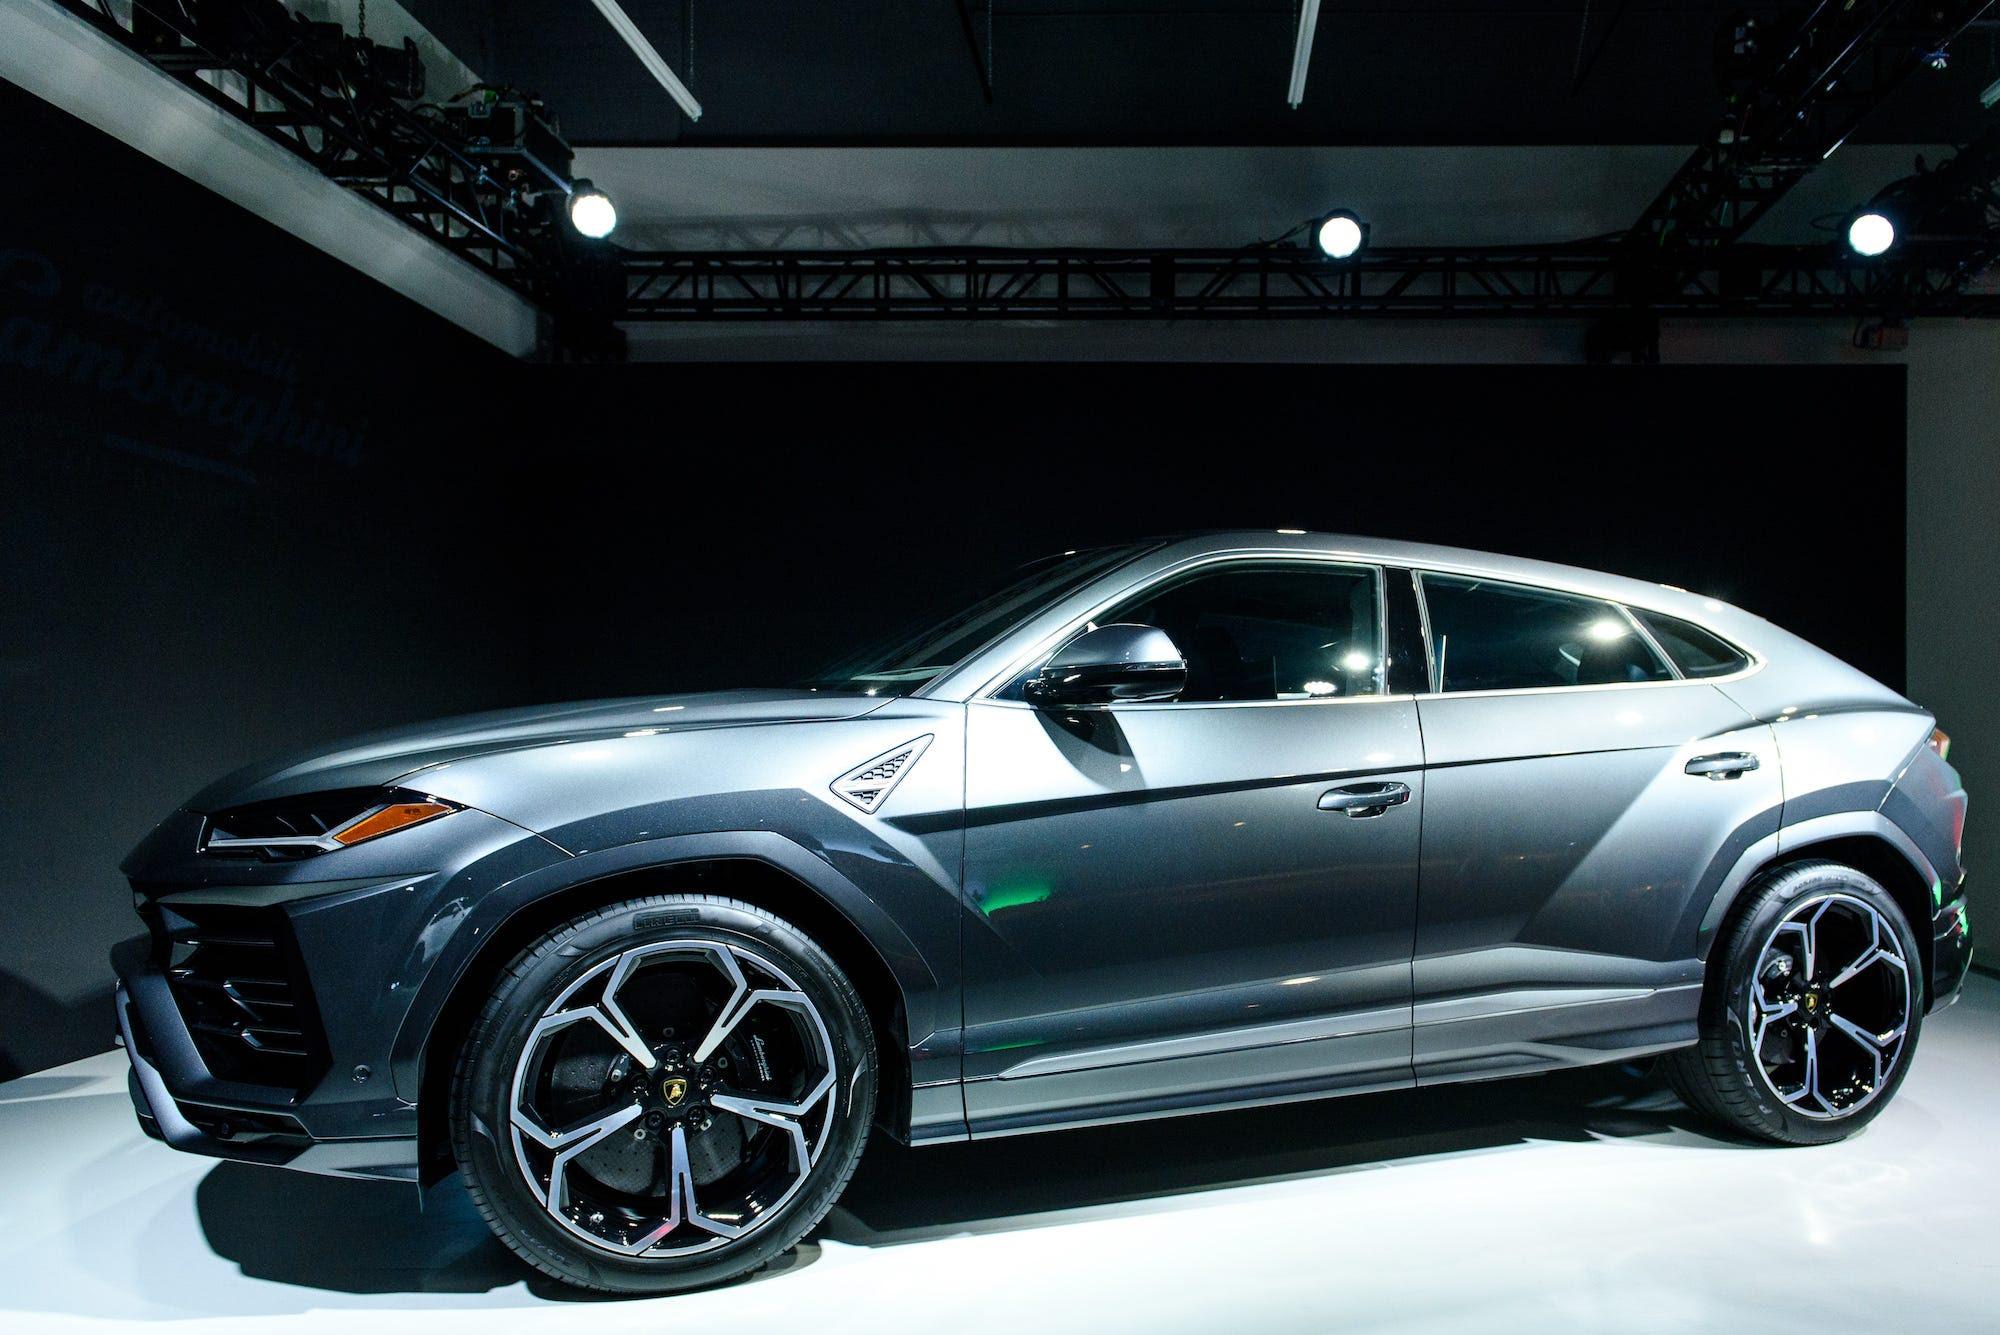 Lamborghini Urus designer drawing with tape  Business Insider